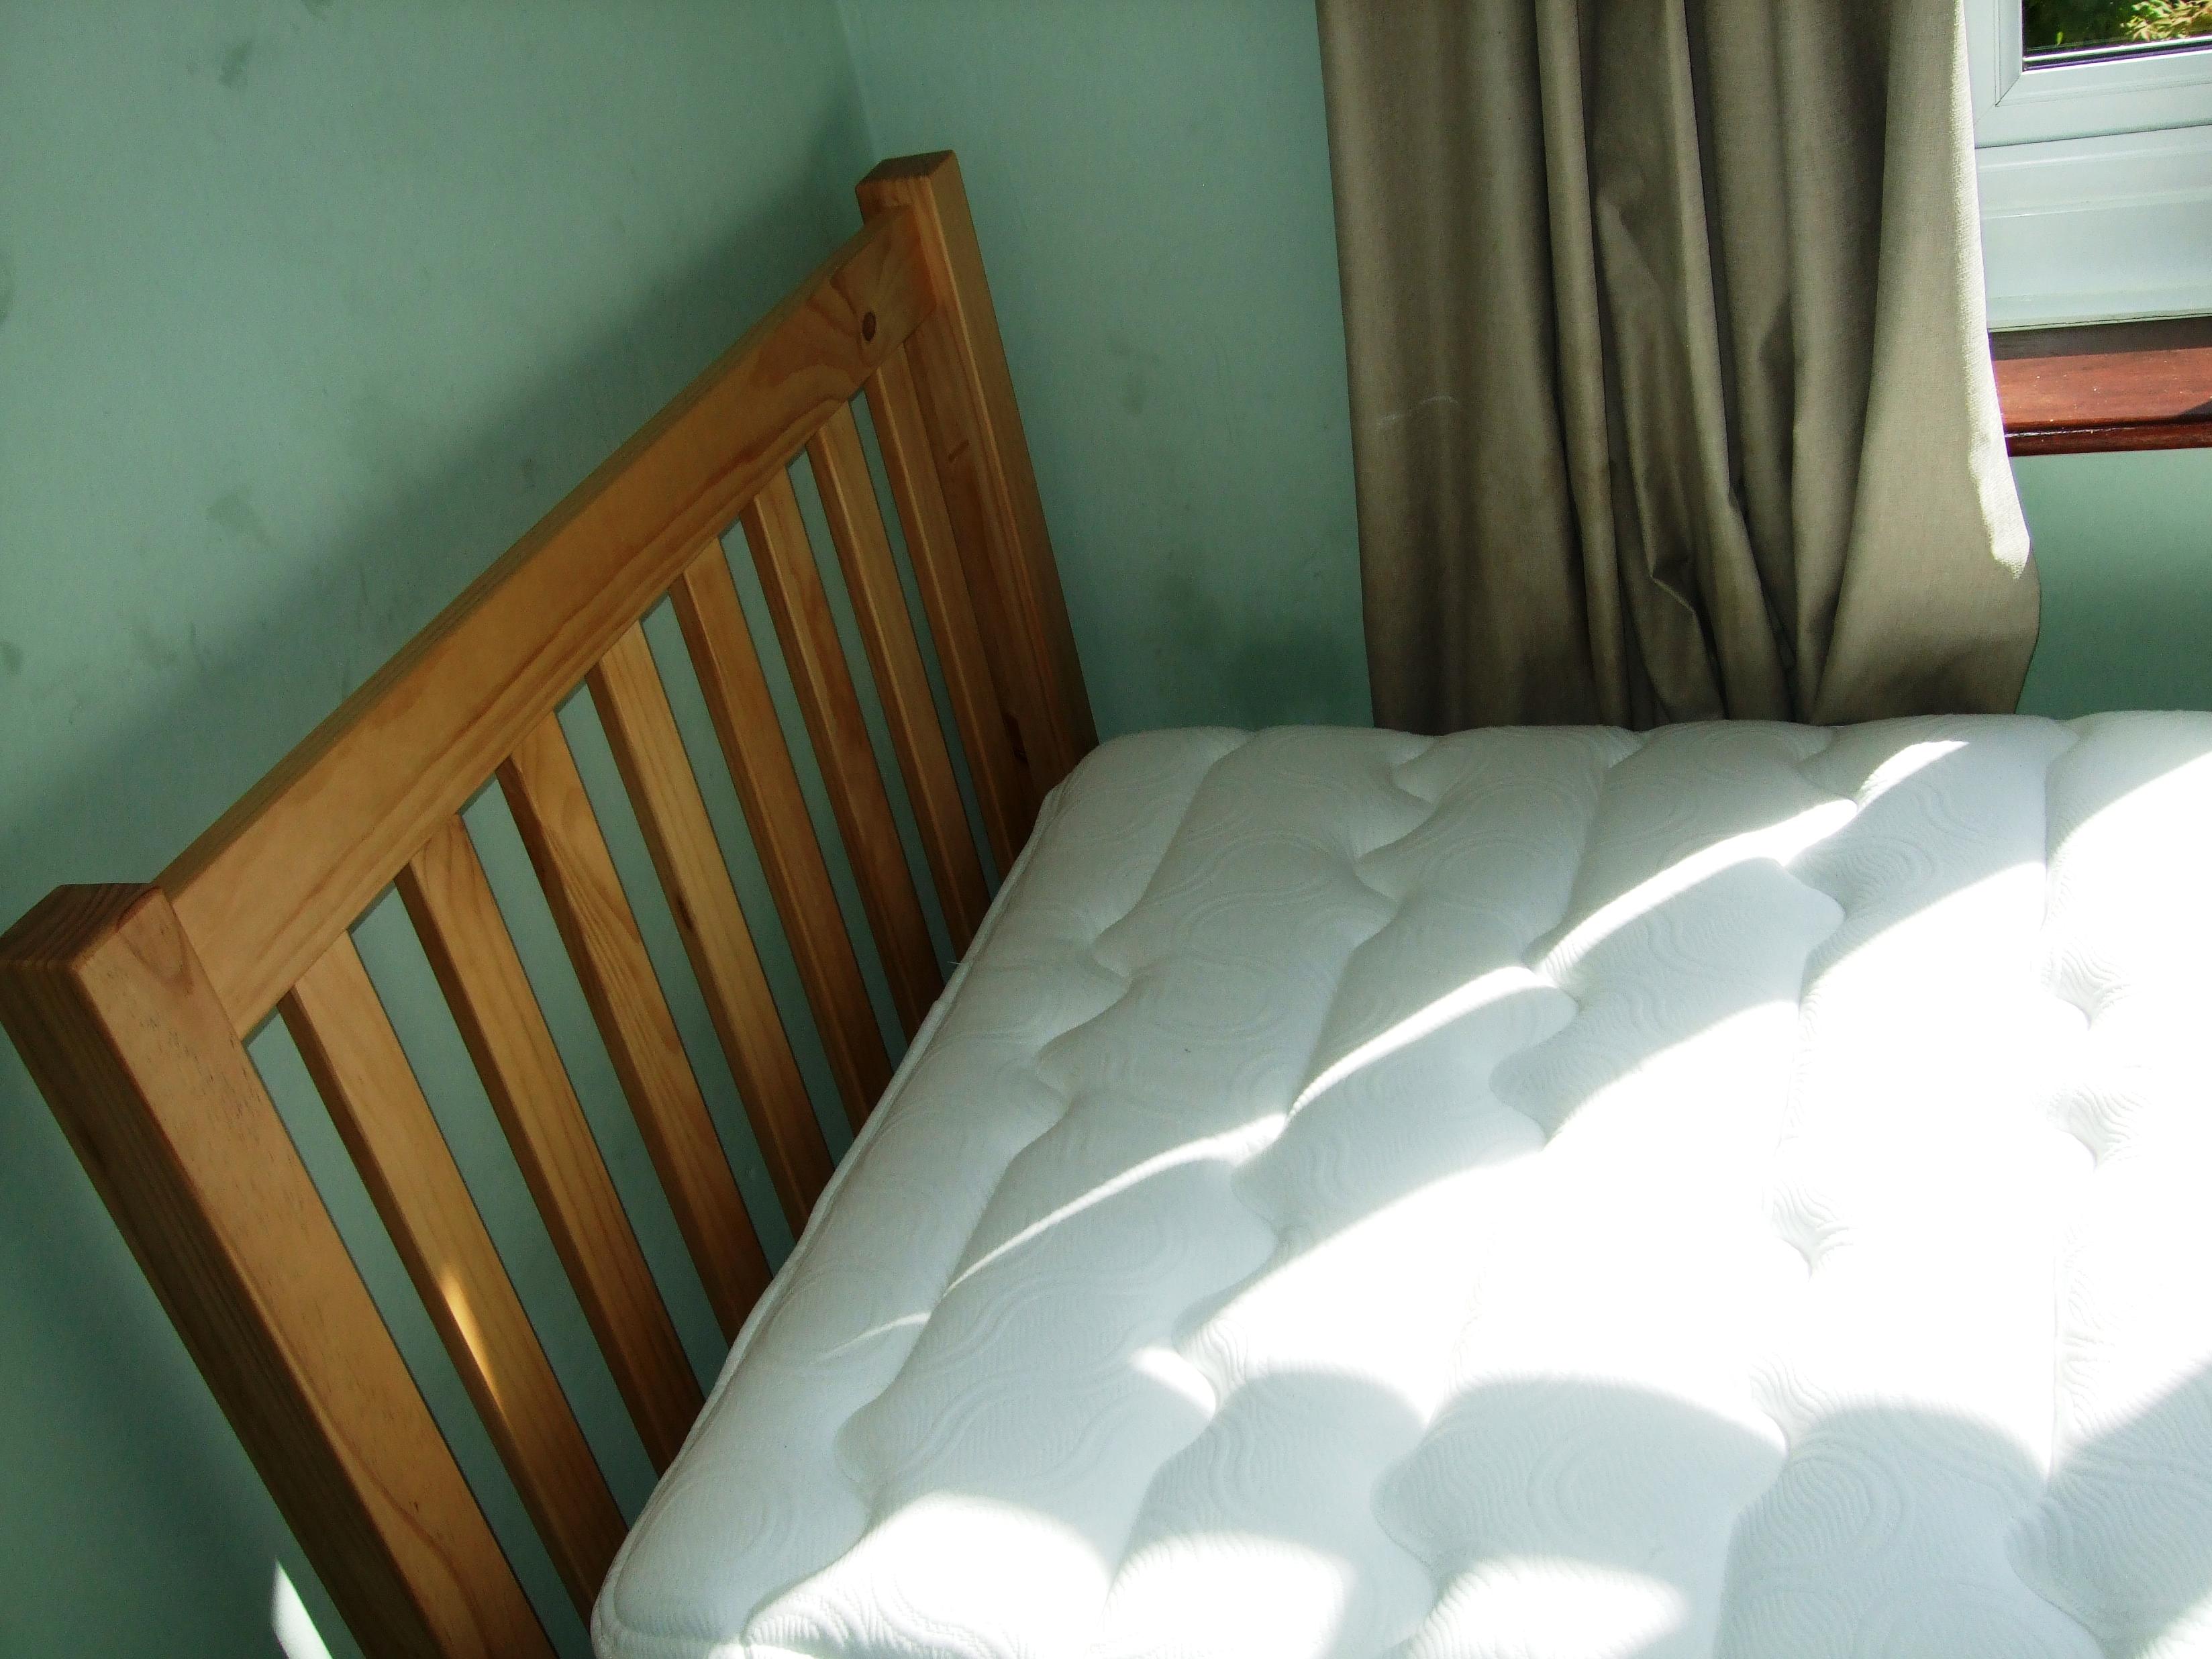 Looking for a good night's sleep?